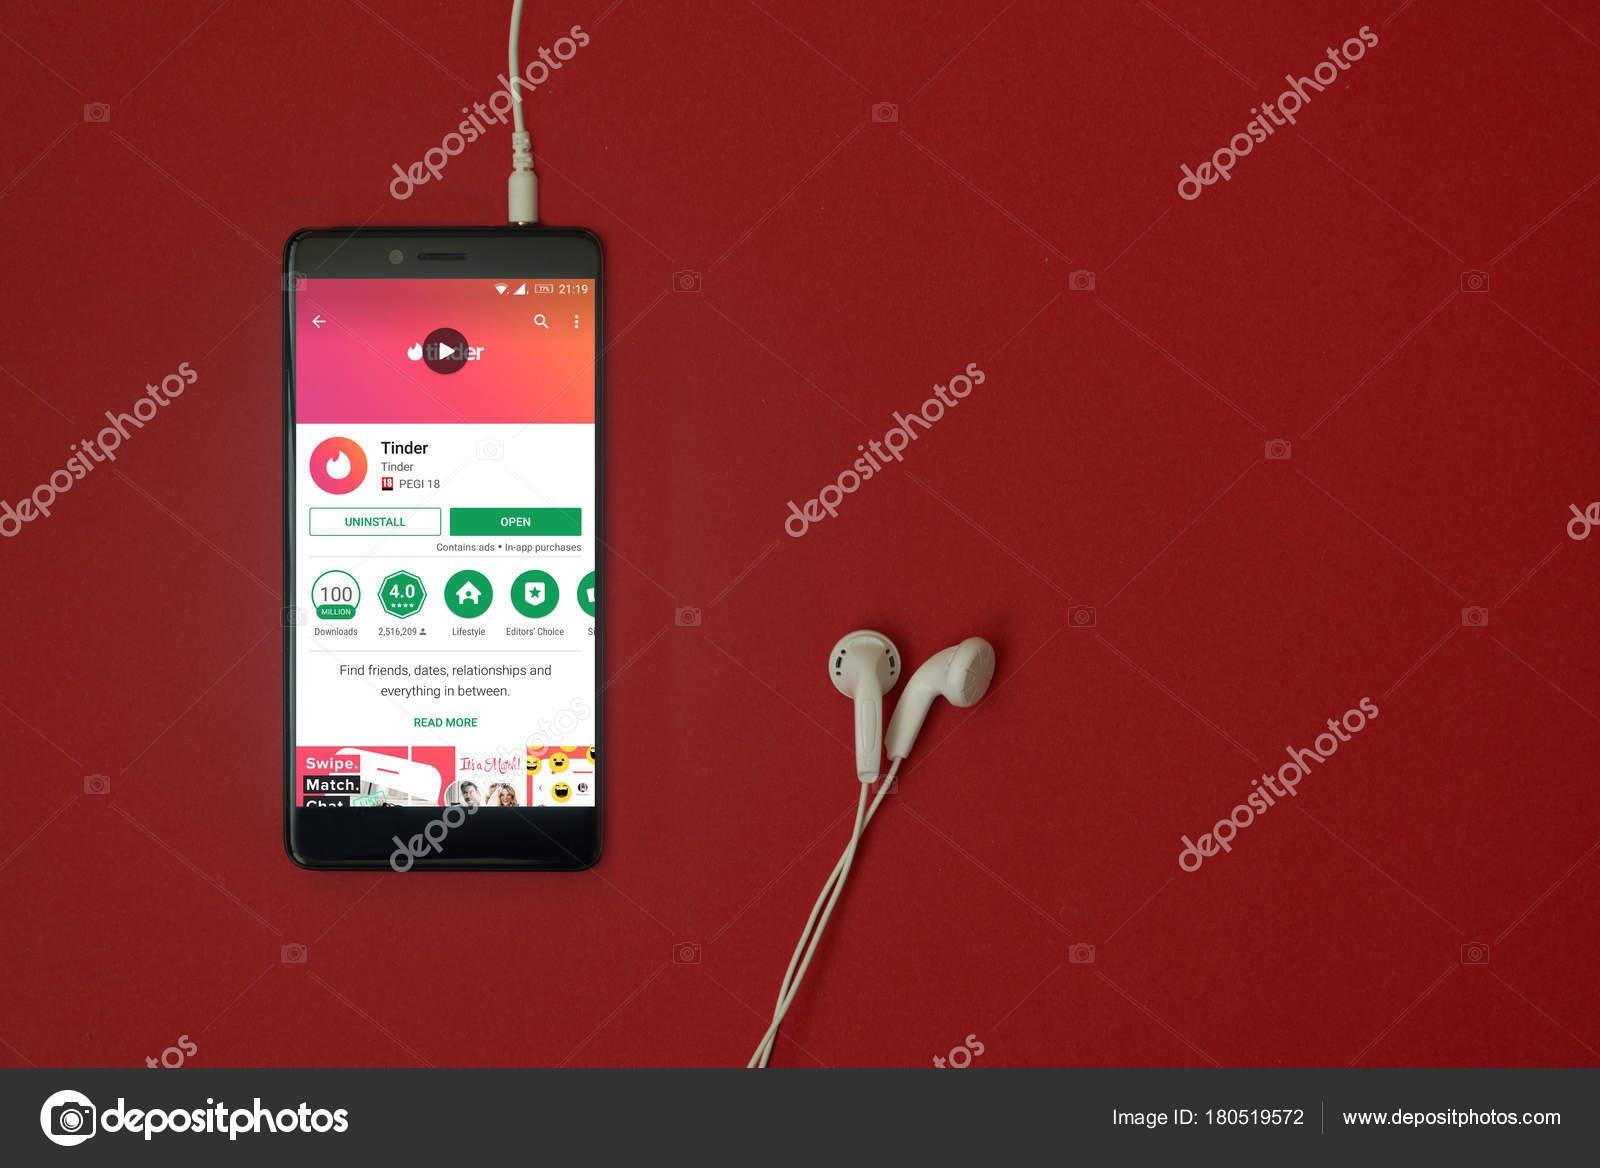 Los Angeles January 2018 Smartphone Tinder Application Google Play